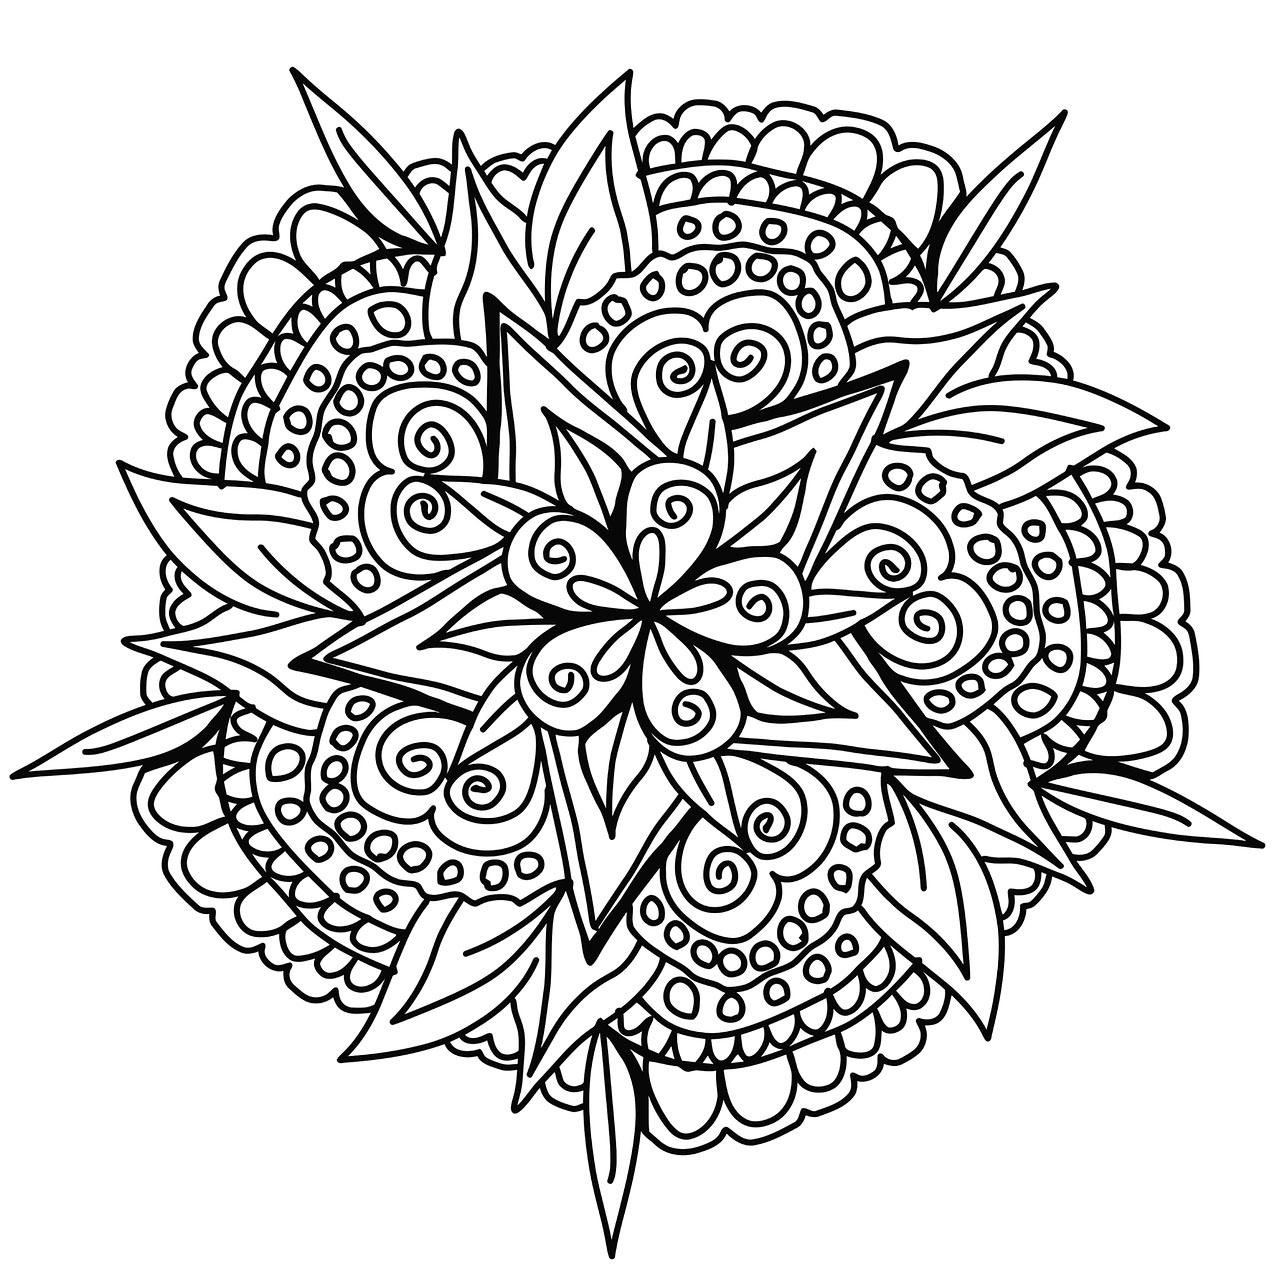 Cool Hand Drawn Mandala Mandalas With Flowers Vegetation 100